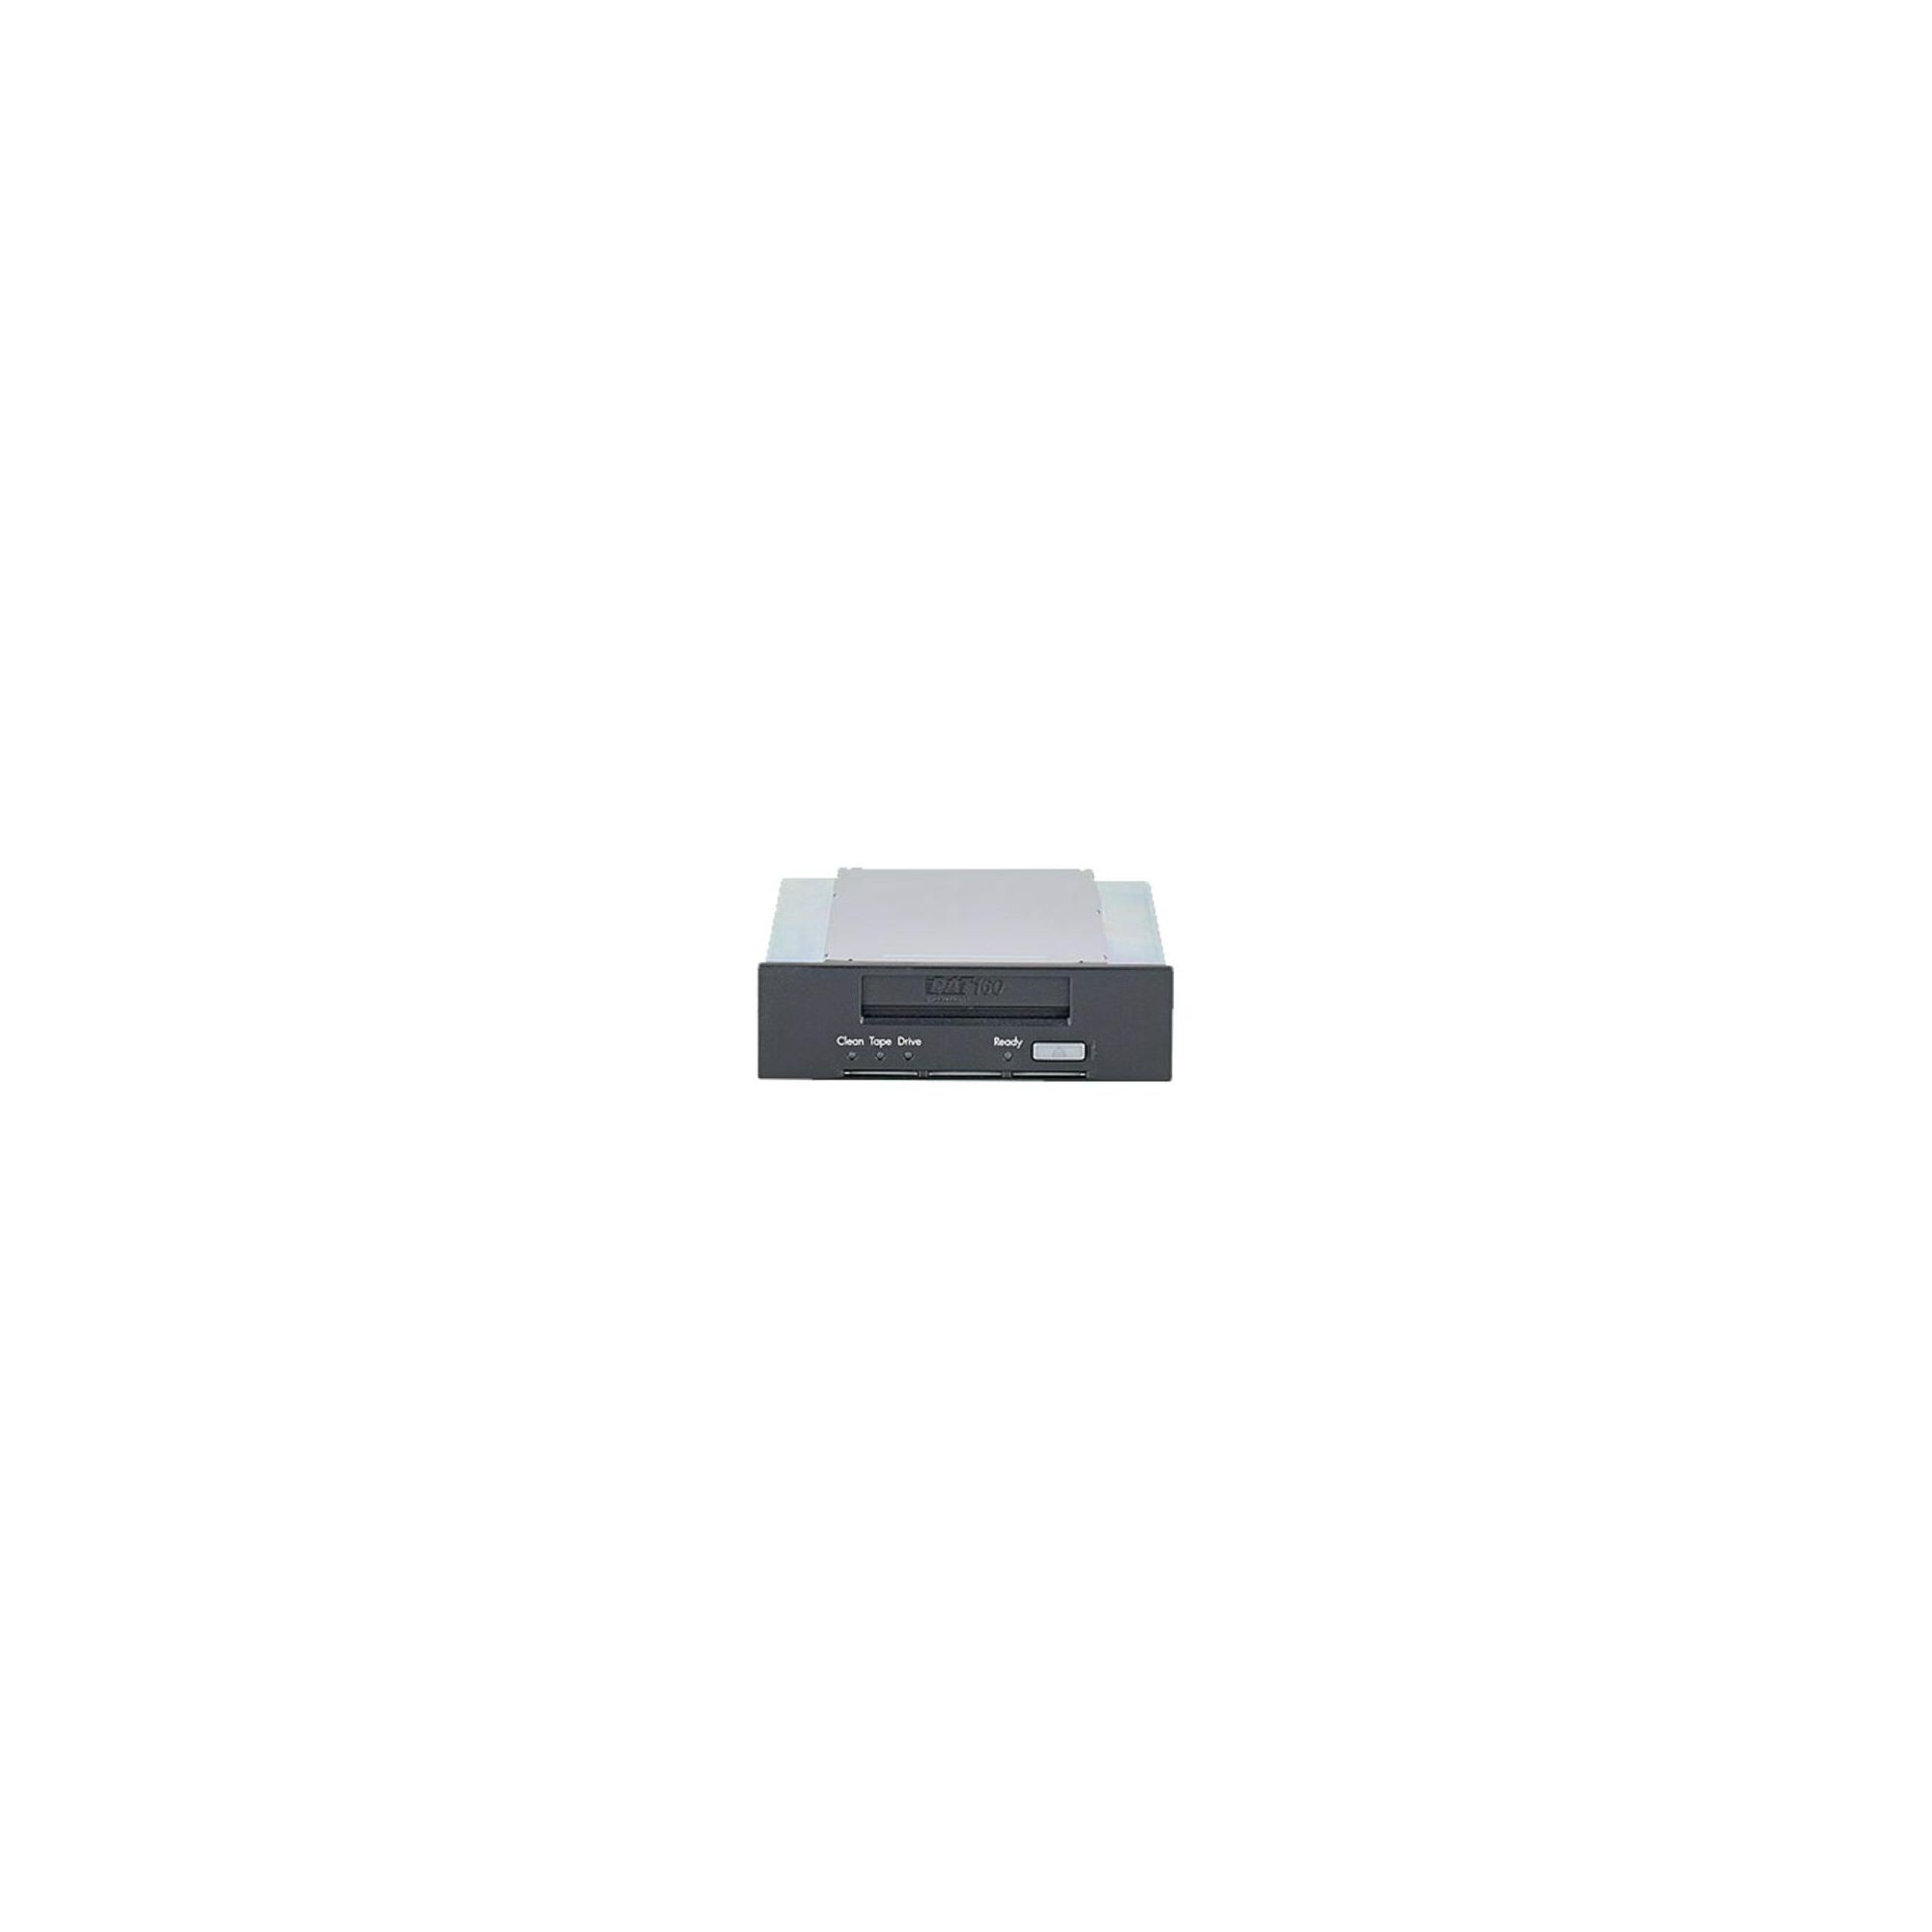 Freecom DAT-160i 80/160GB USB Tape Drive (Internal) at Tesco Direct